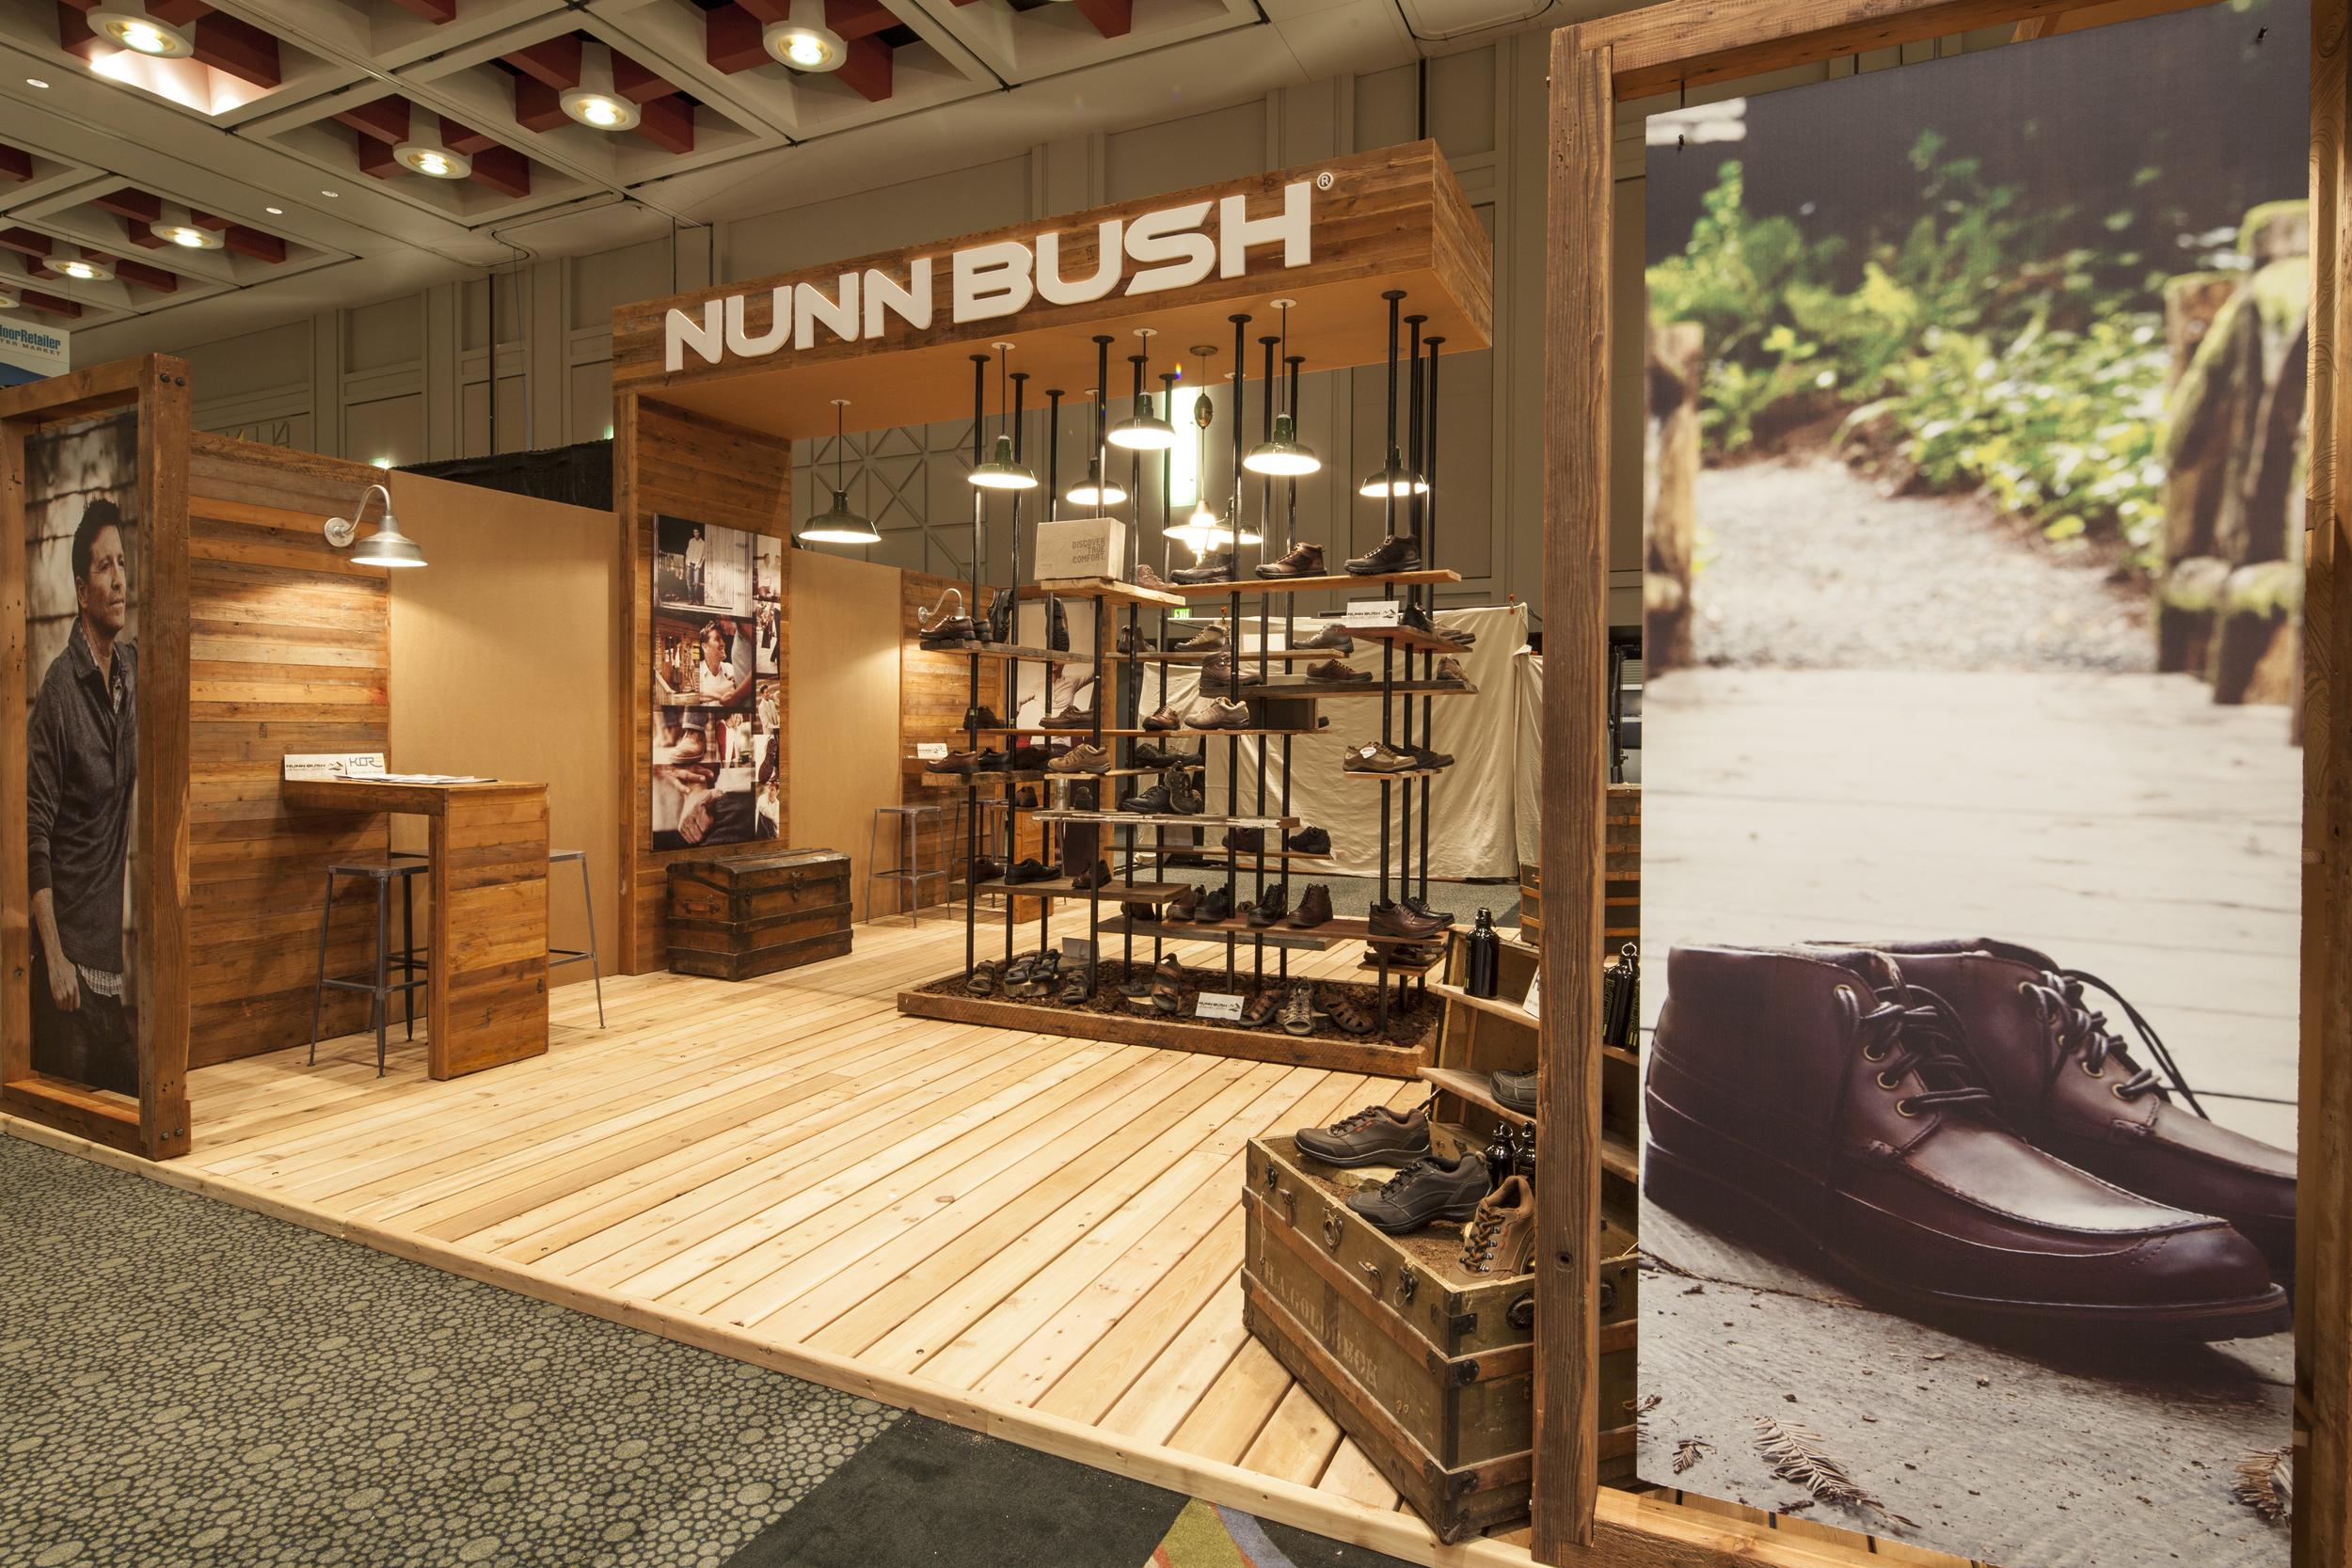 NunnBush-WOR12-012